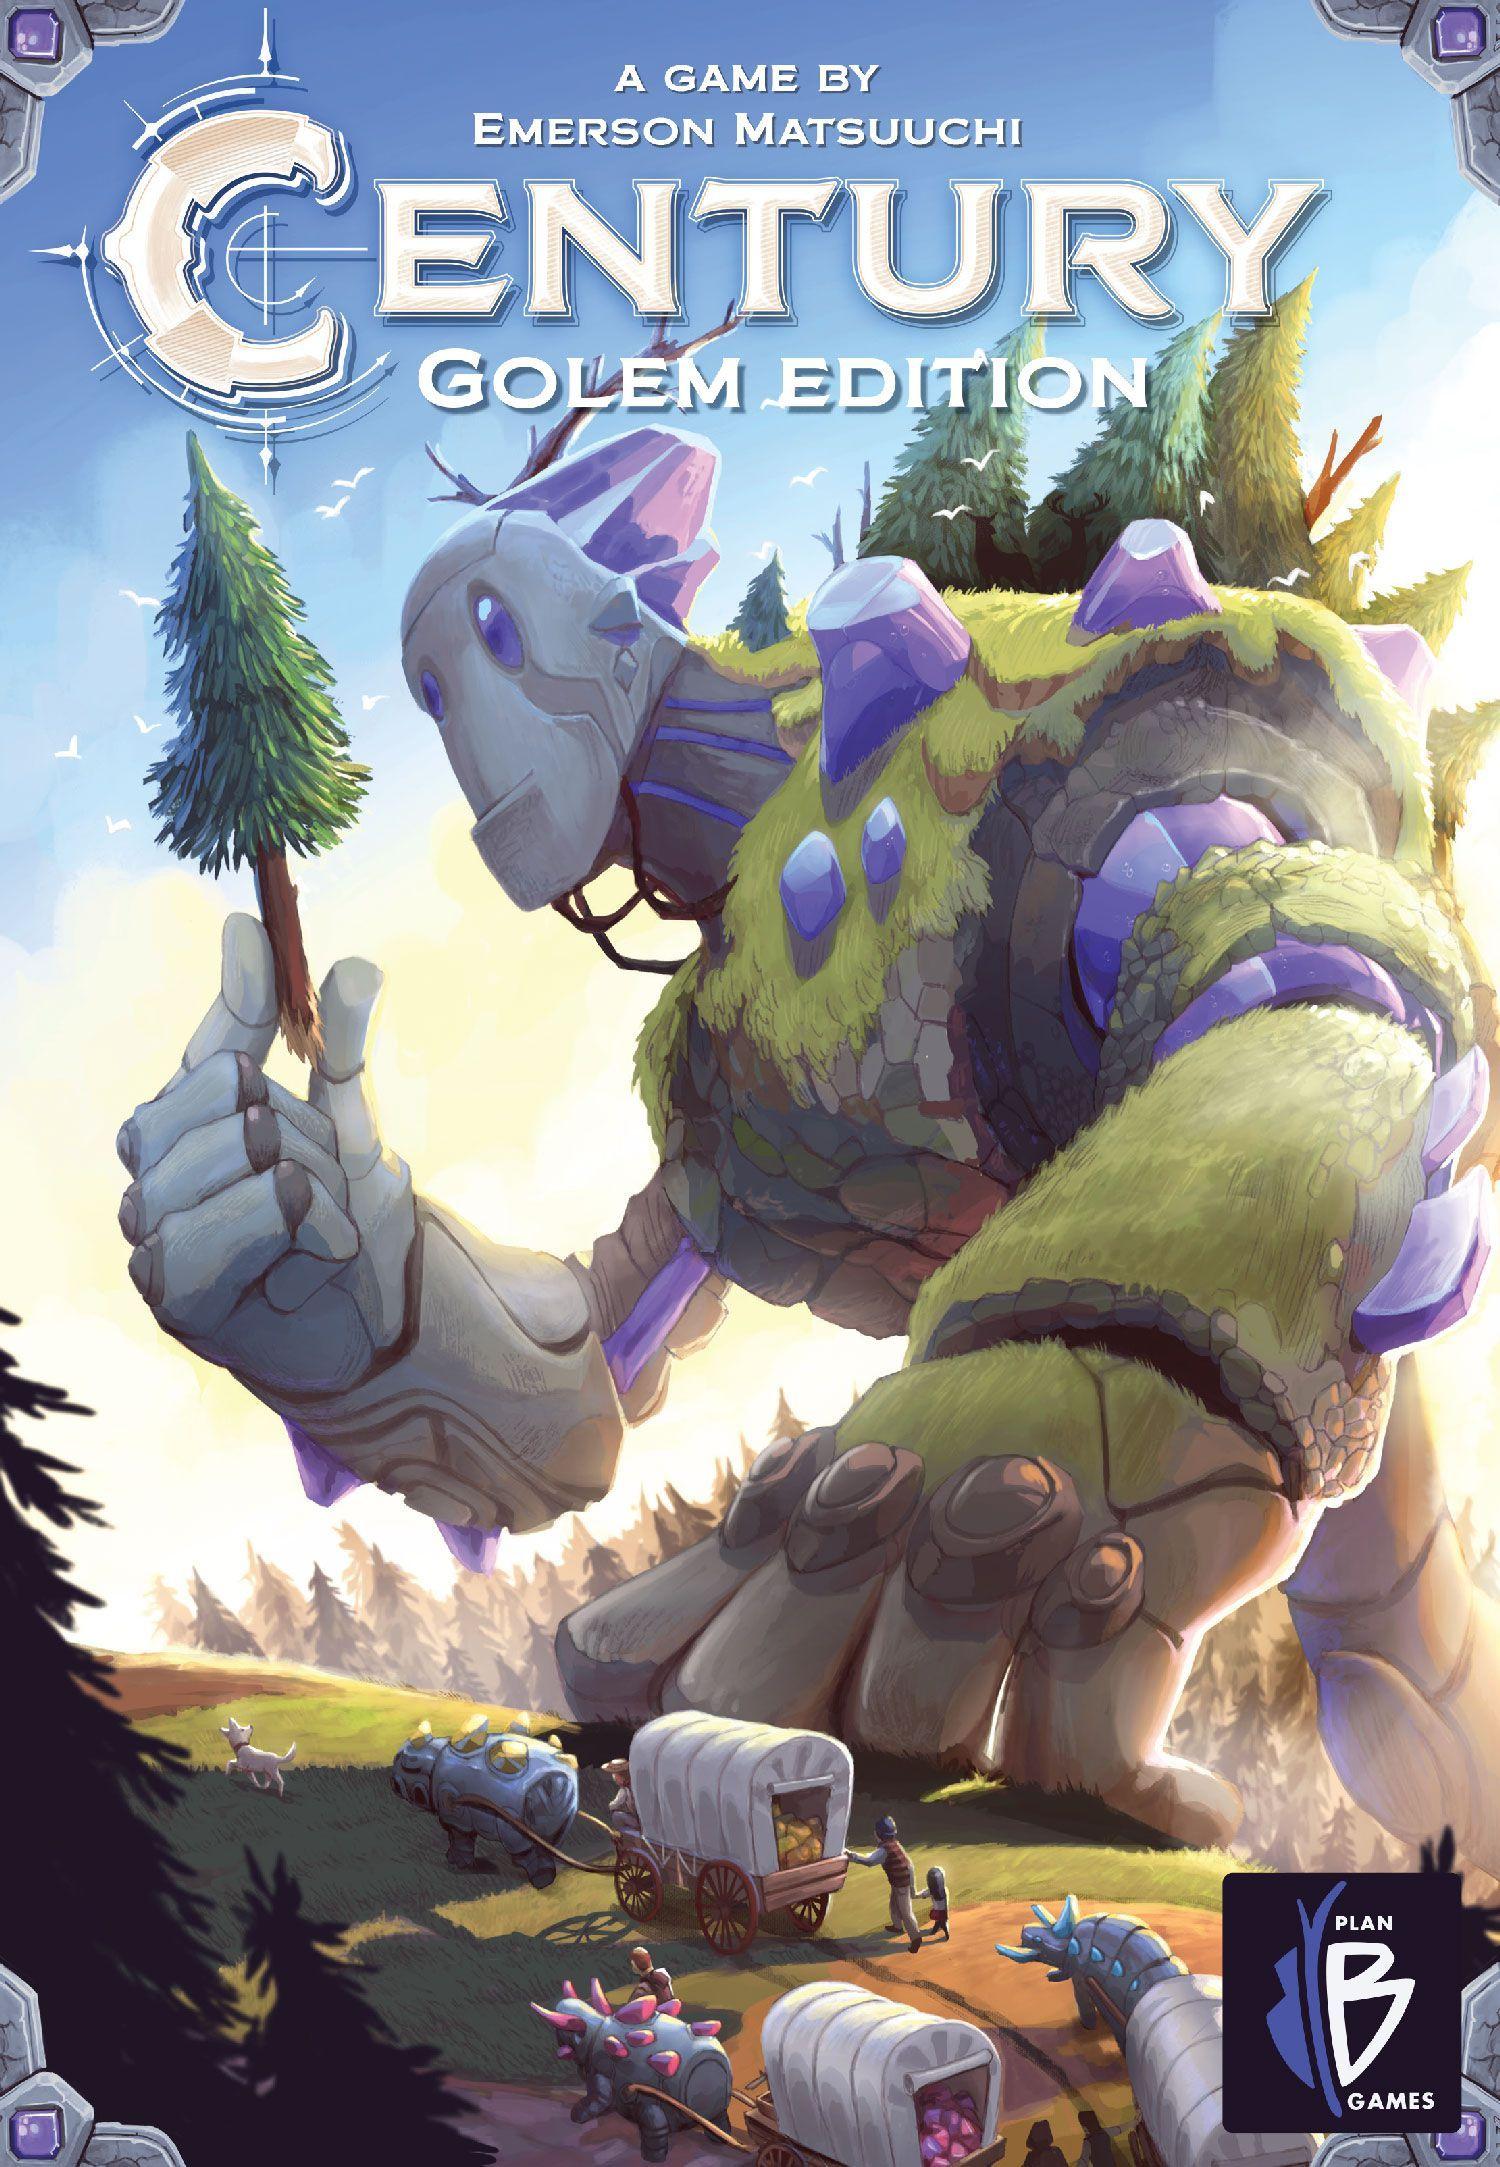 Main image for Century: Golem Edition